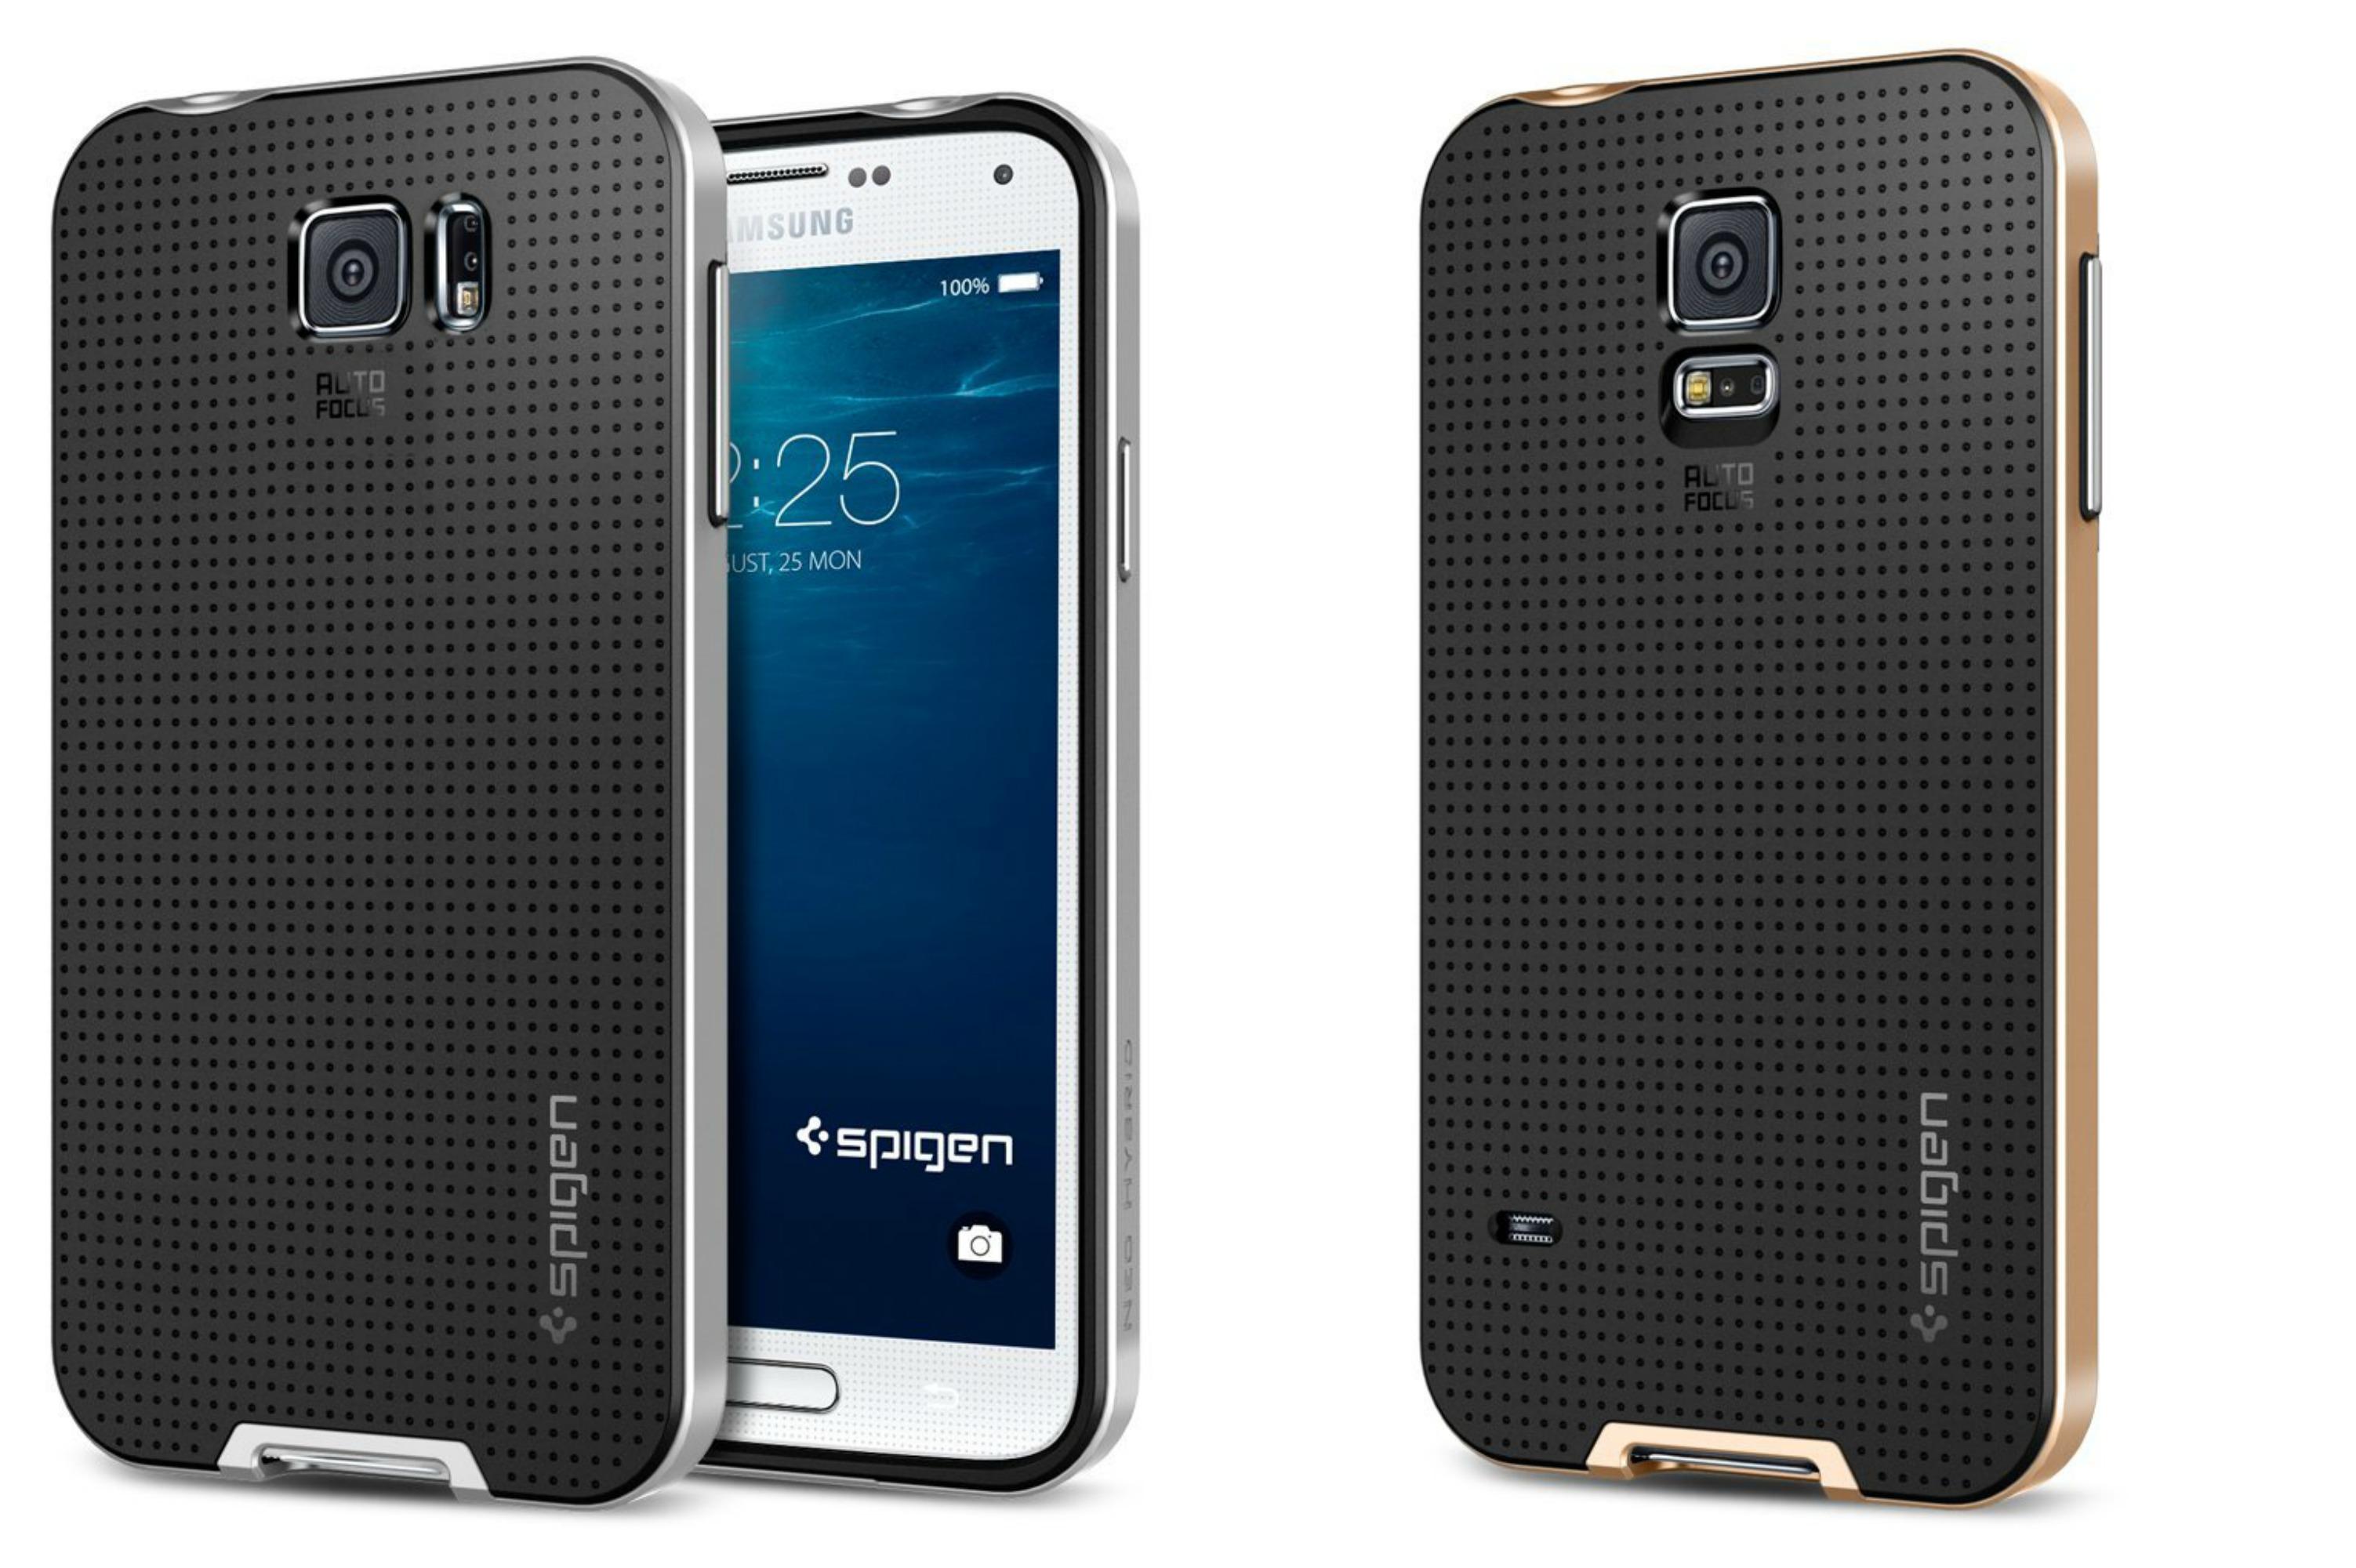 timeless design ba3da c19b2 Spigen already has Galaxy S6 cases, shows subtle differences from ...